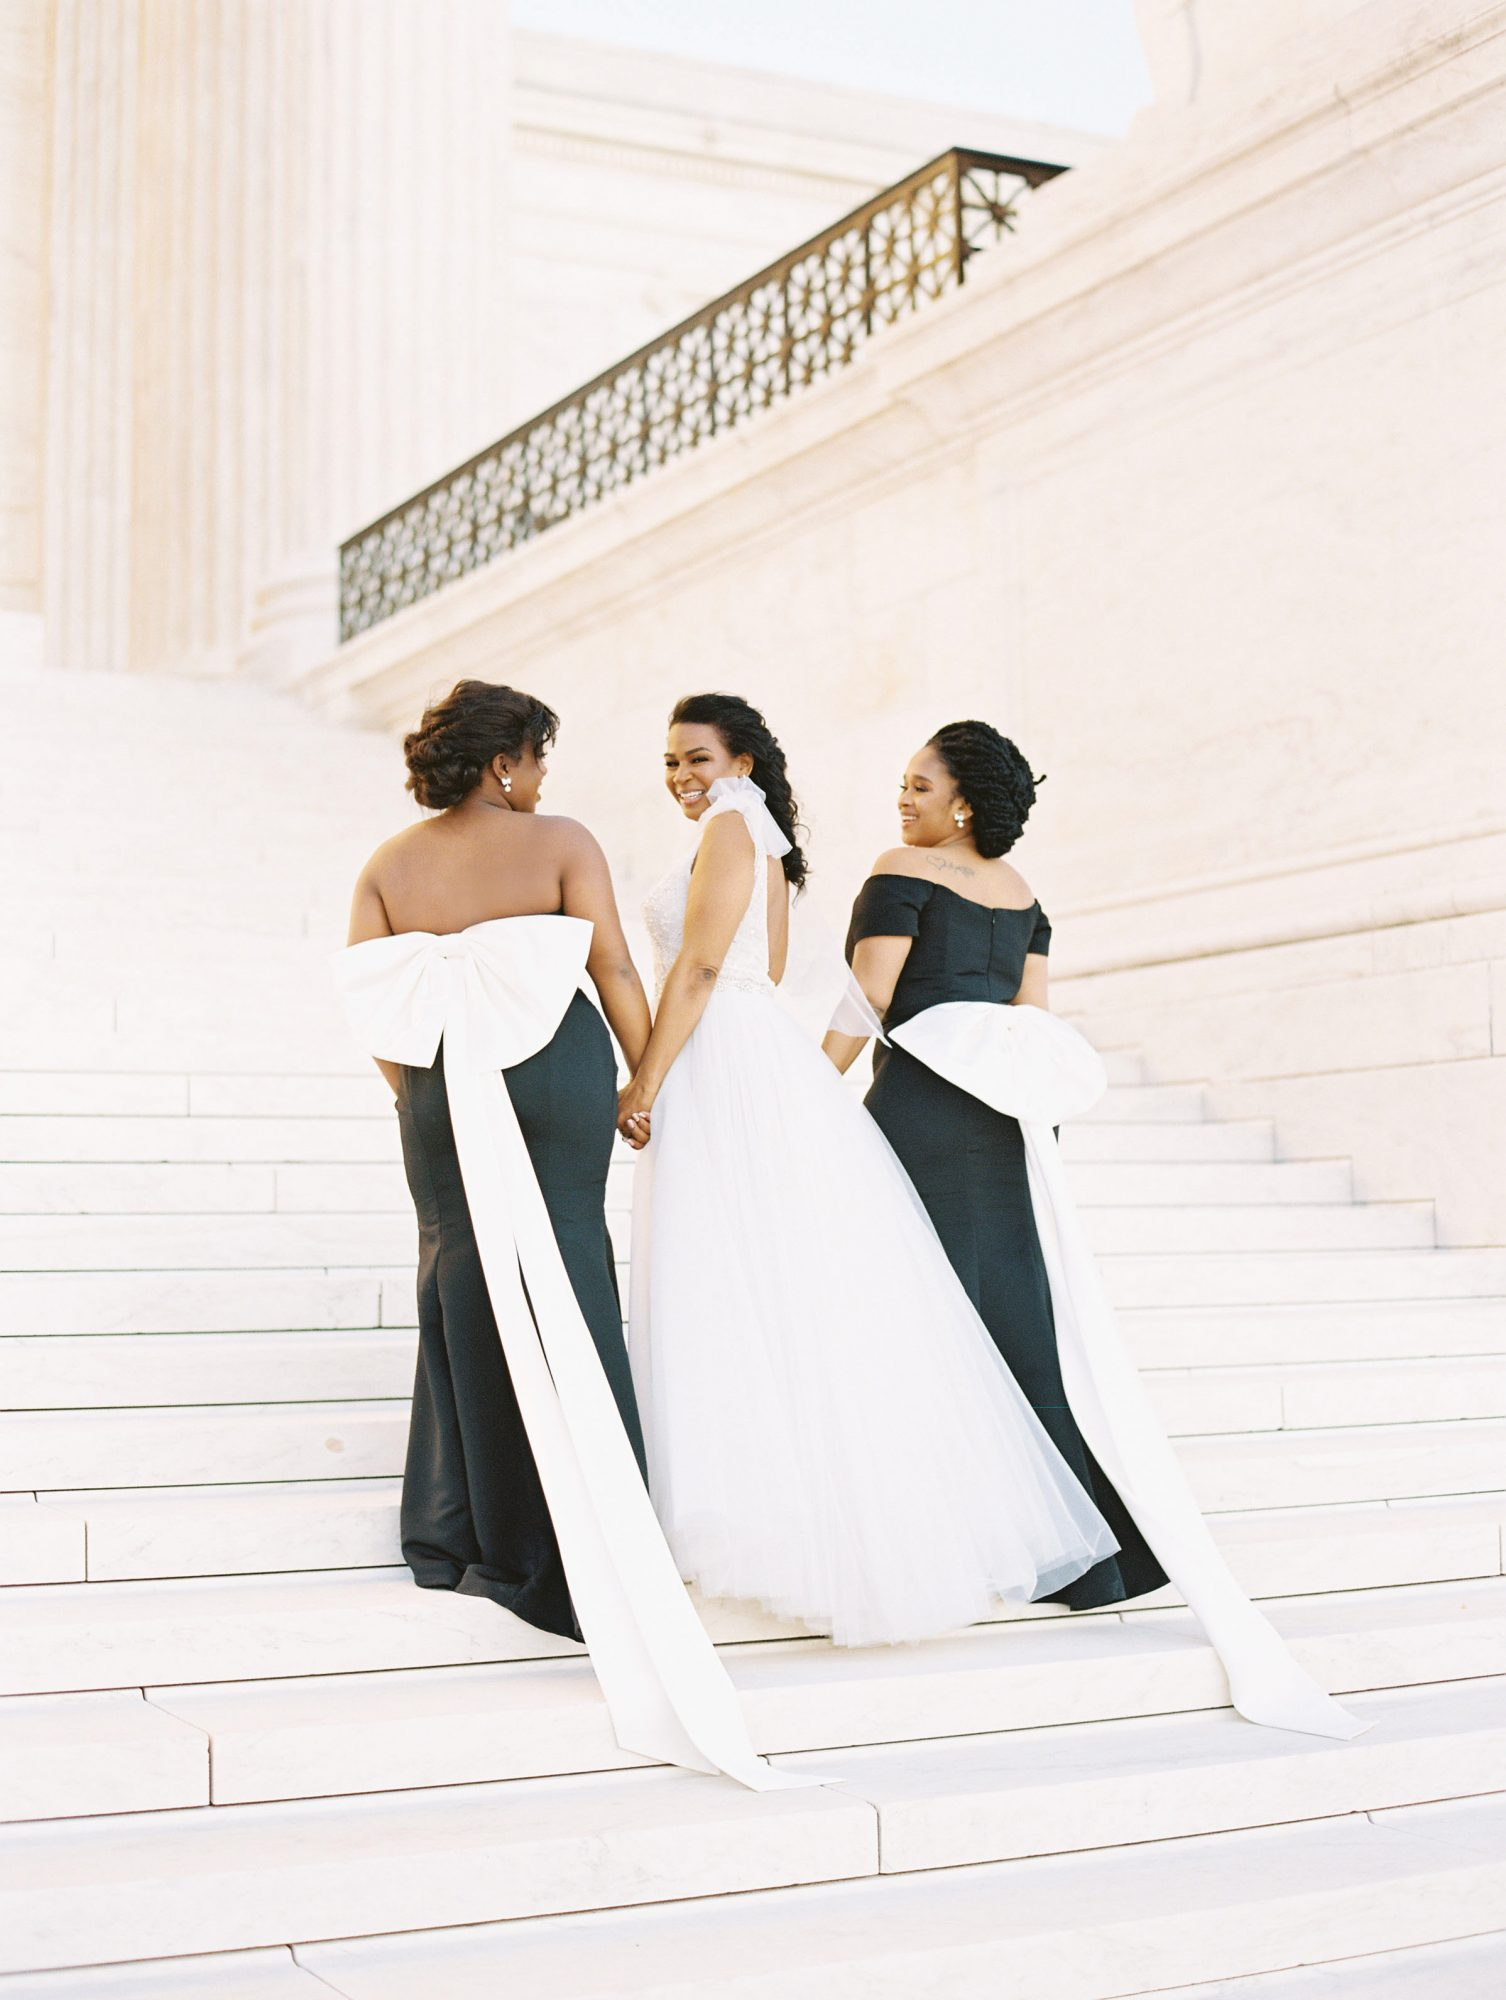 denita john wedding bridesmaids and bride